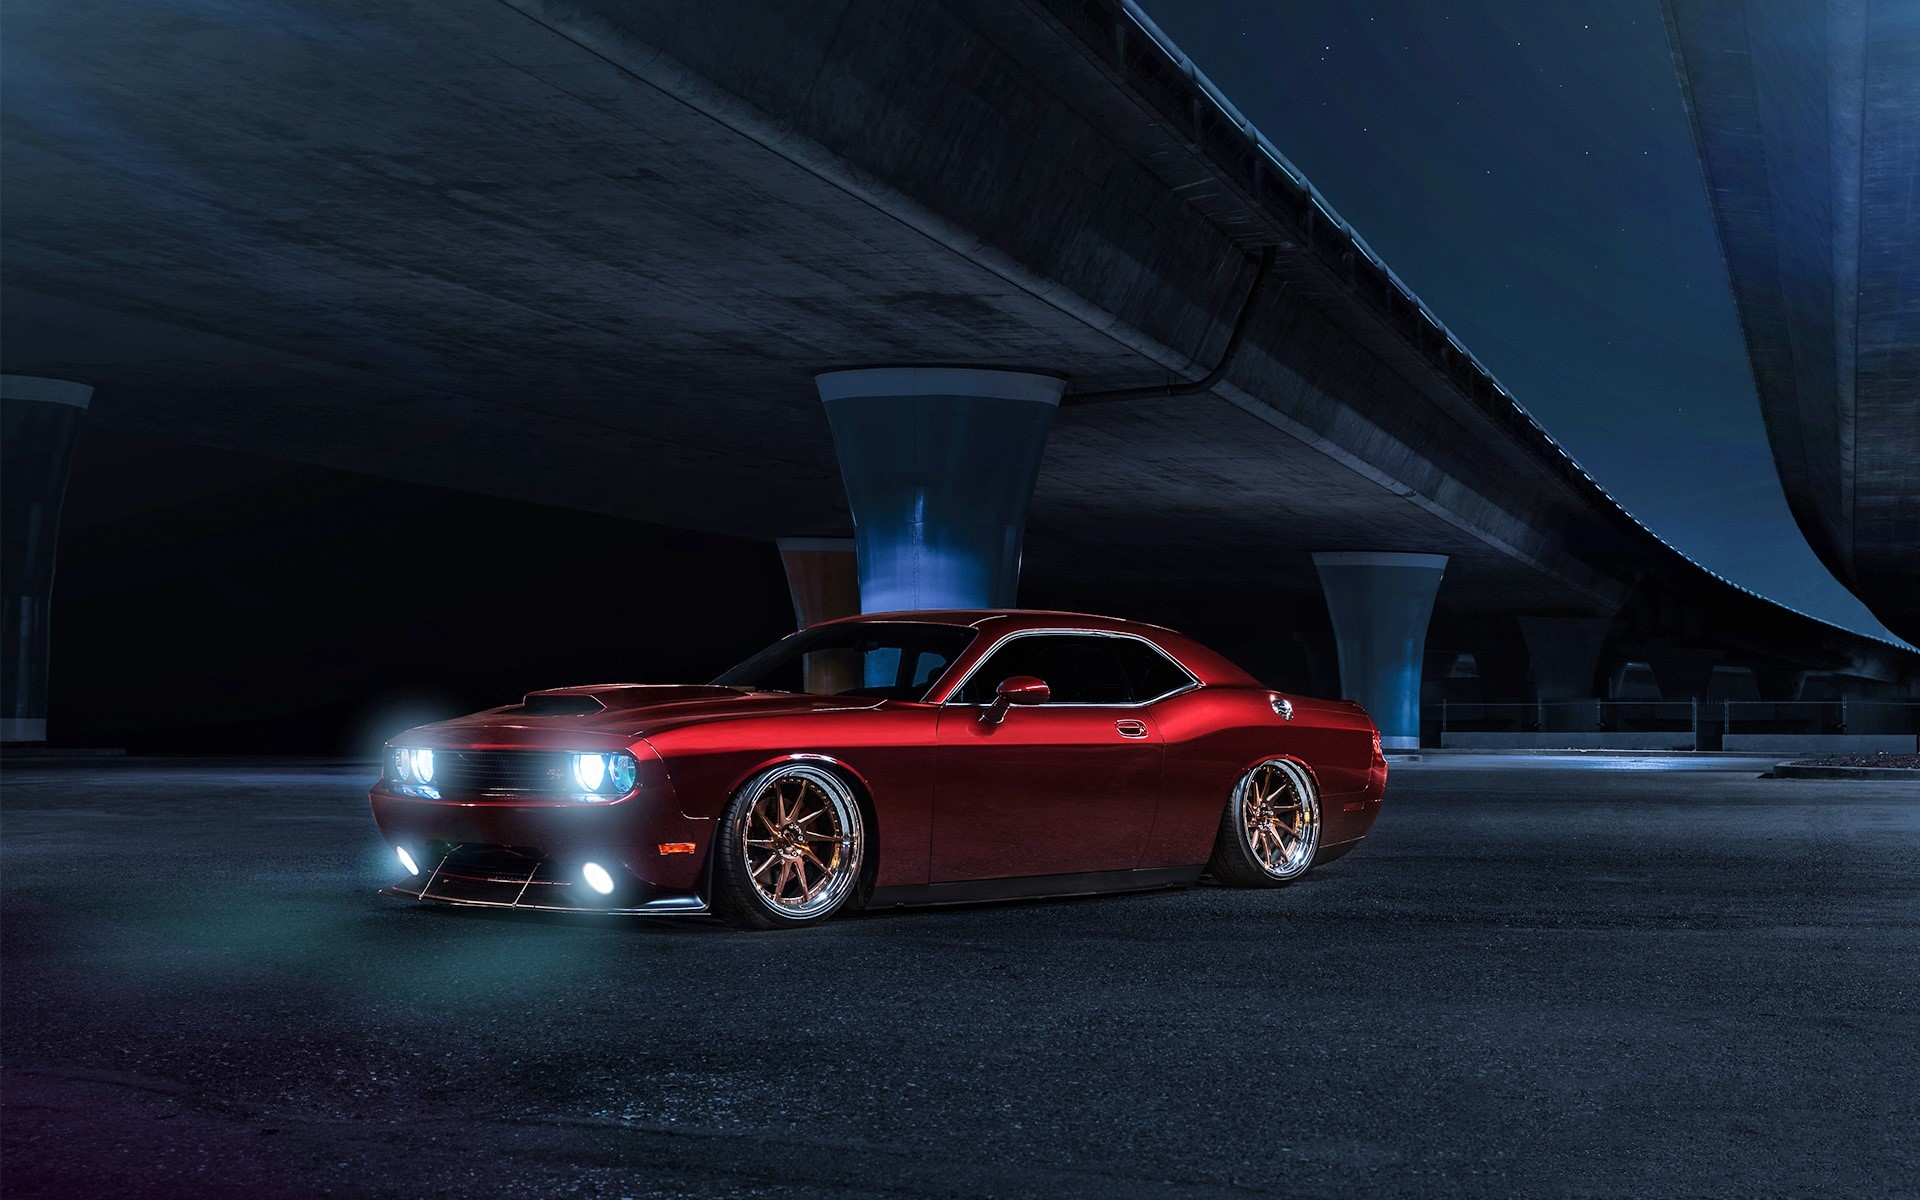 Fondos de pantalla Dodge Challenger Avant Garde Wheels